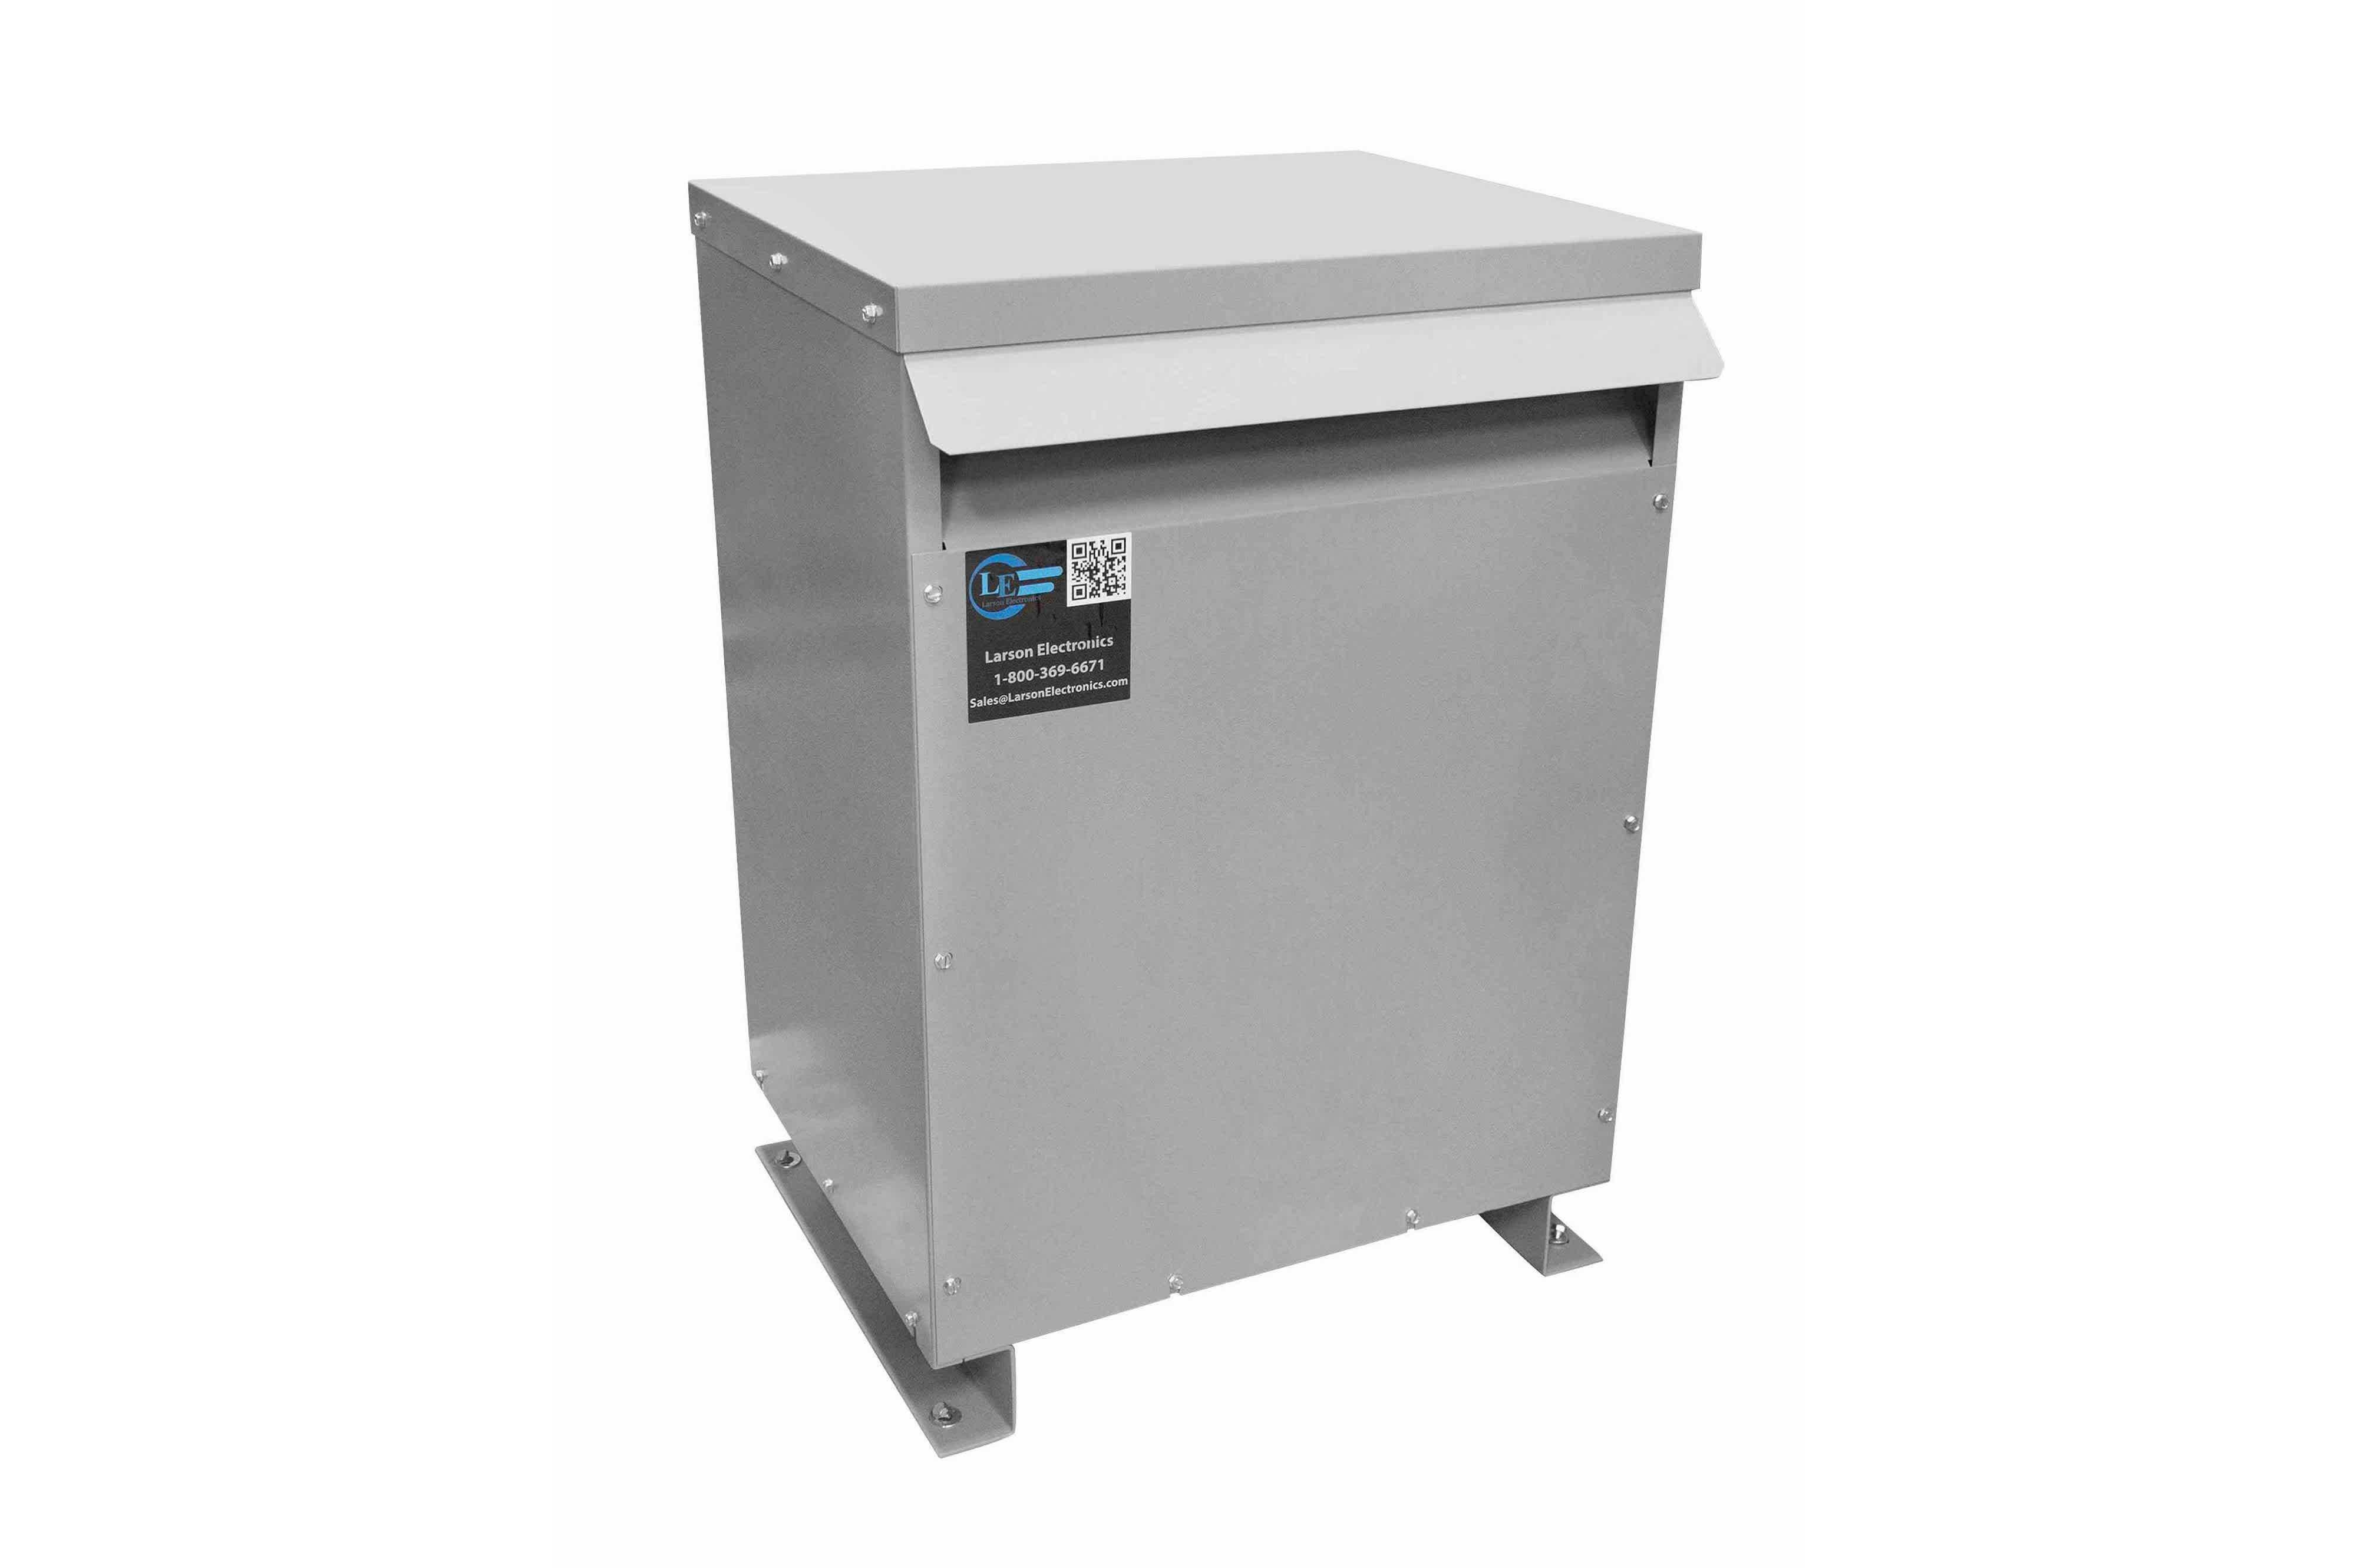 10 kVA 3PH Isolation Transformer, 460V Wye Primary, 600V Delta Secondary, N3R, Ventilated, 60 Hz